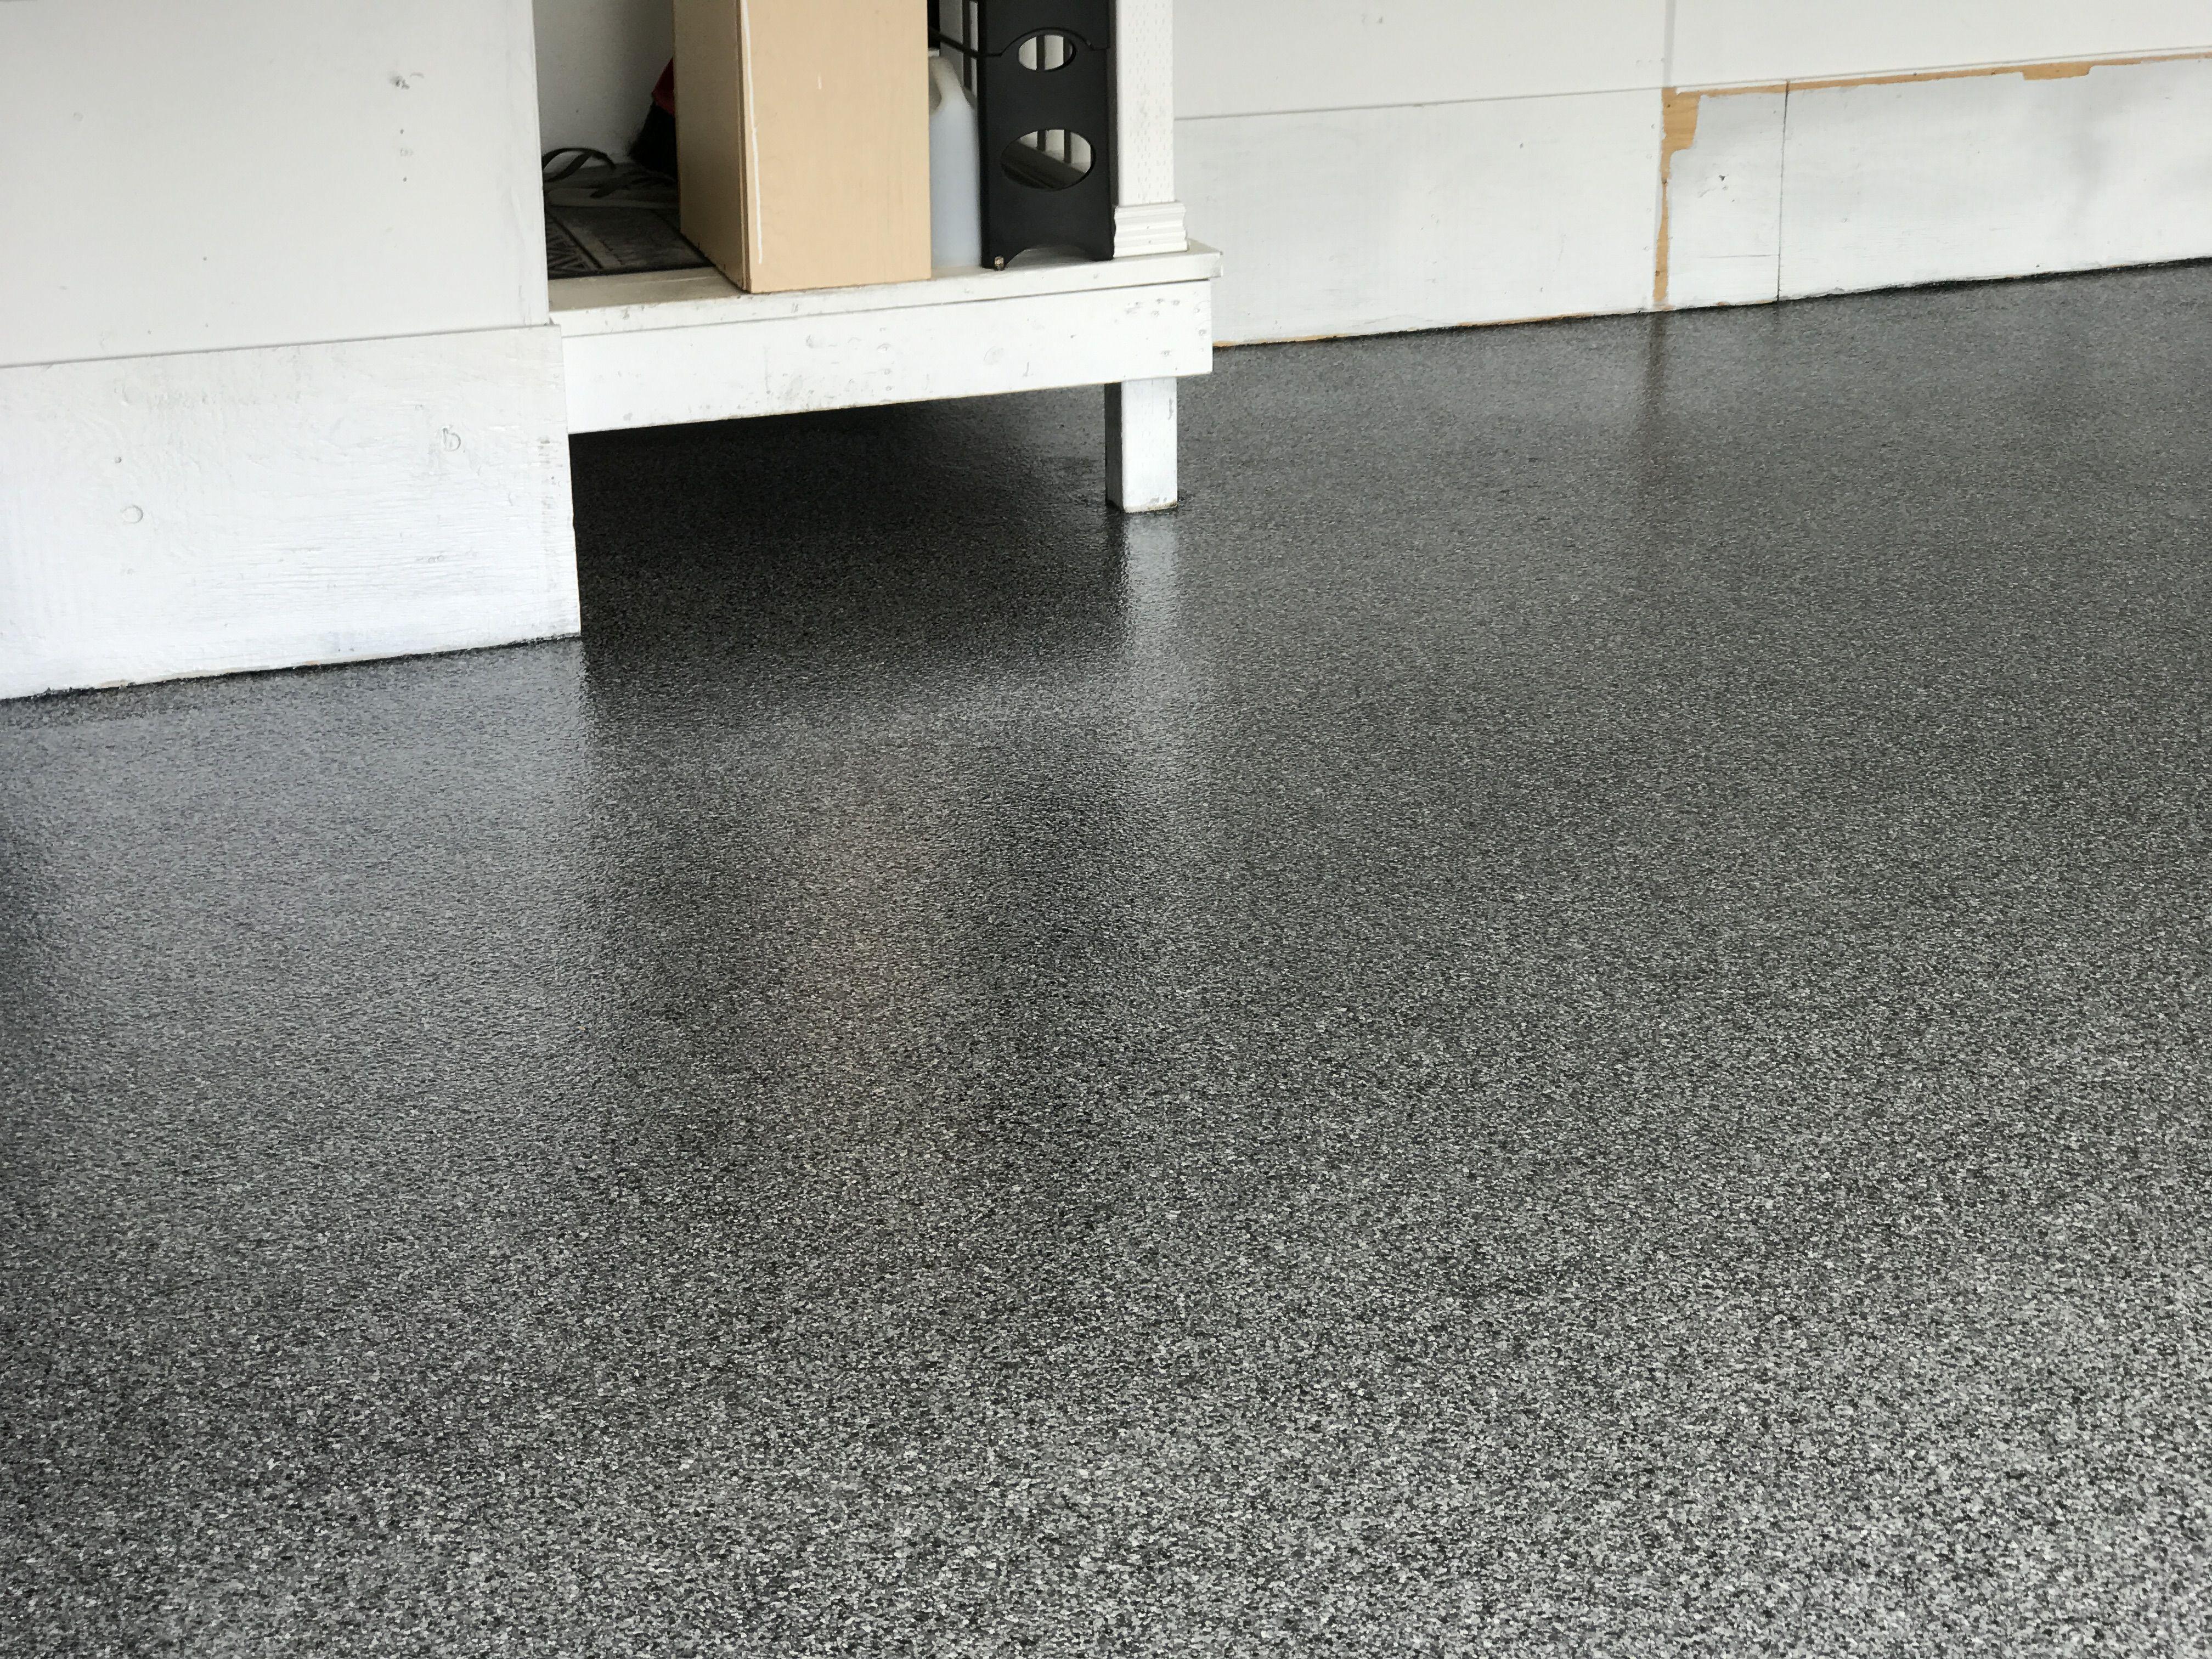 Epoxy Garage Floor Black Basecoat With Nightfall Flakes Completed In Oakville Ont Garage Floor Epoxy Garage Floor Paint Garage Floor